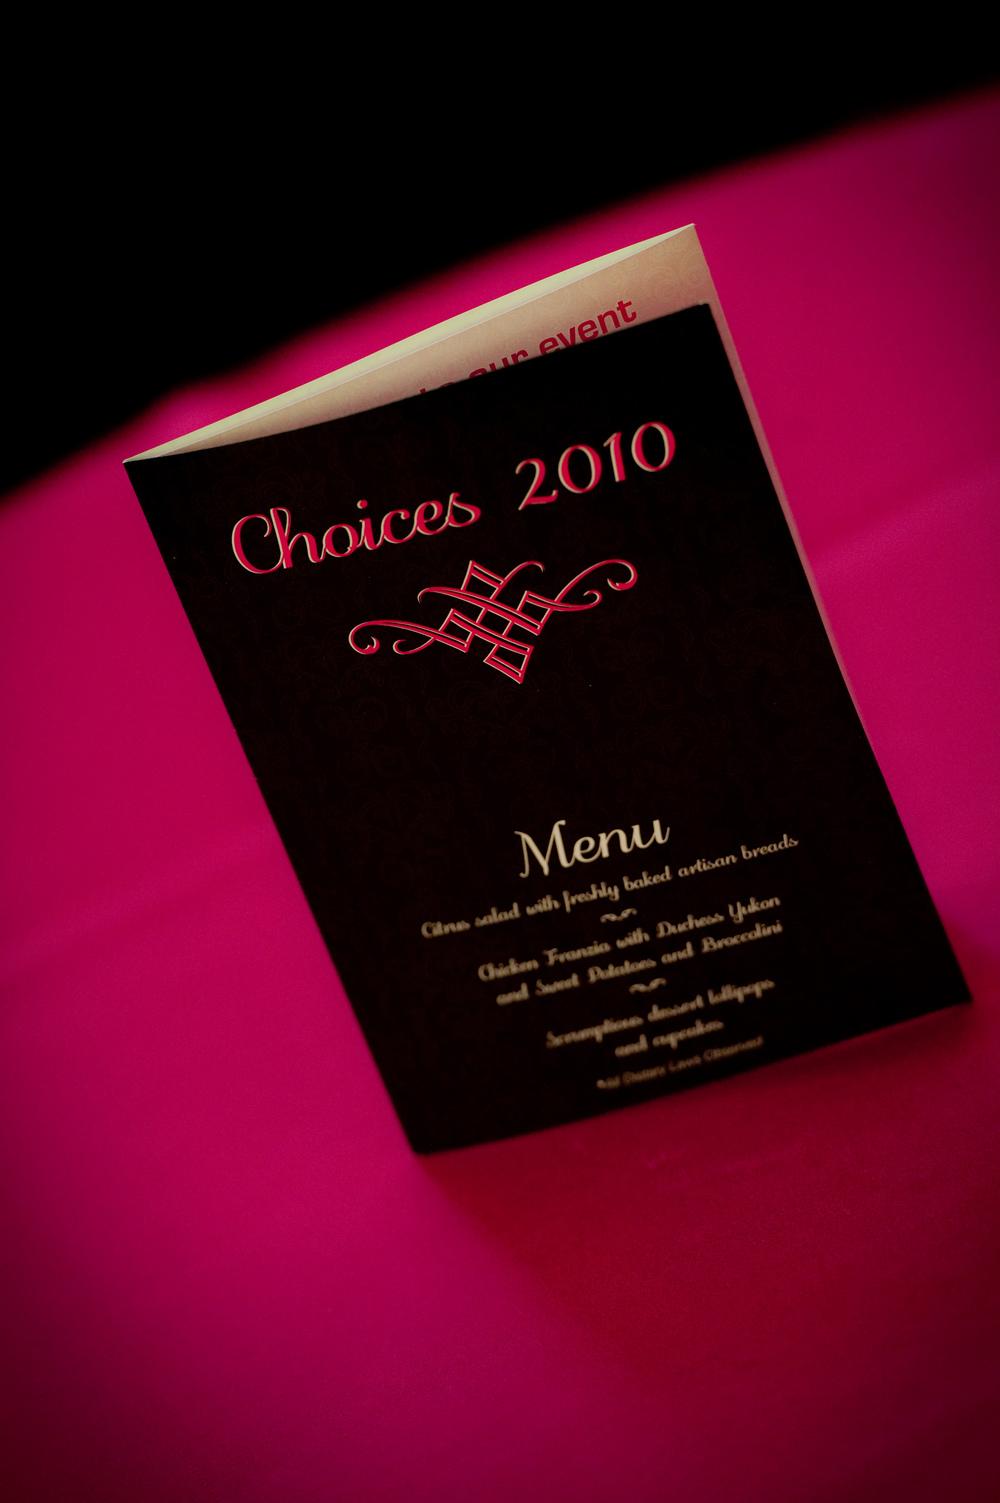 Choices-021.jpg